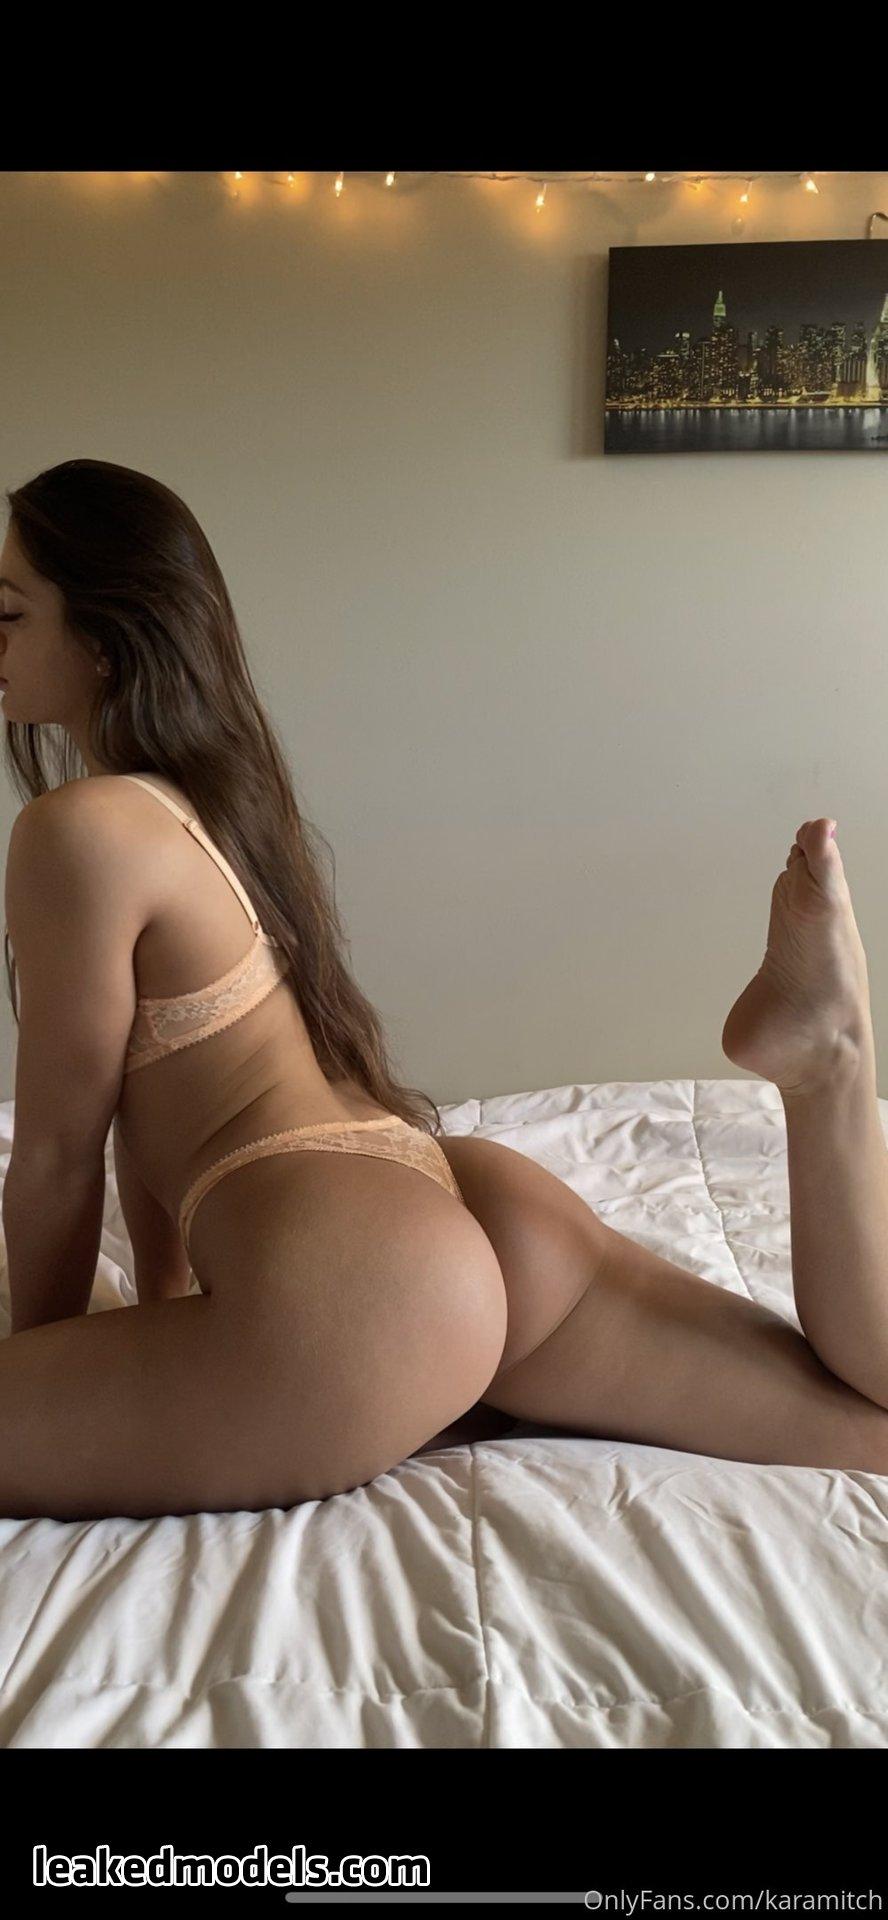 Jakara Mitchell – karamitch OnlyFans Nude Leaks (30 Photos)